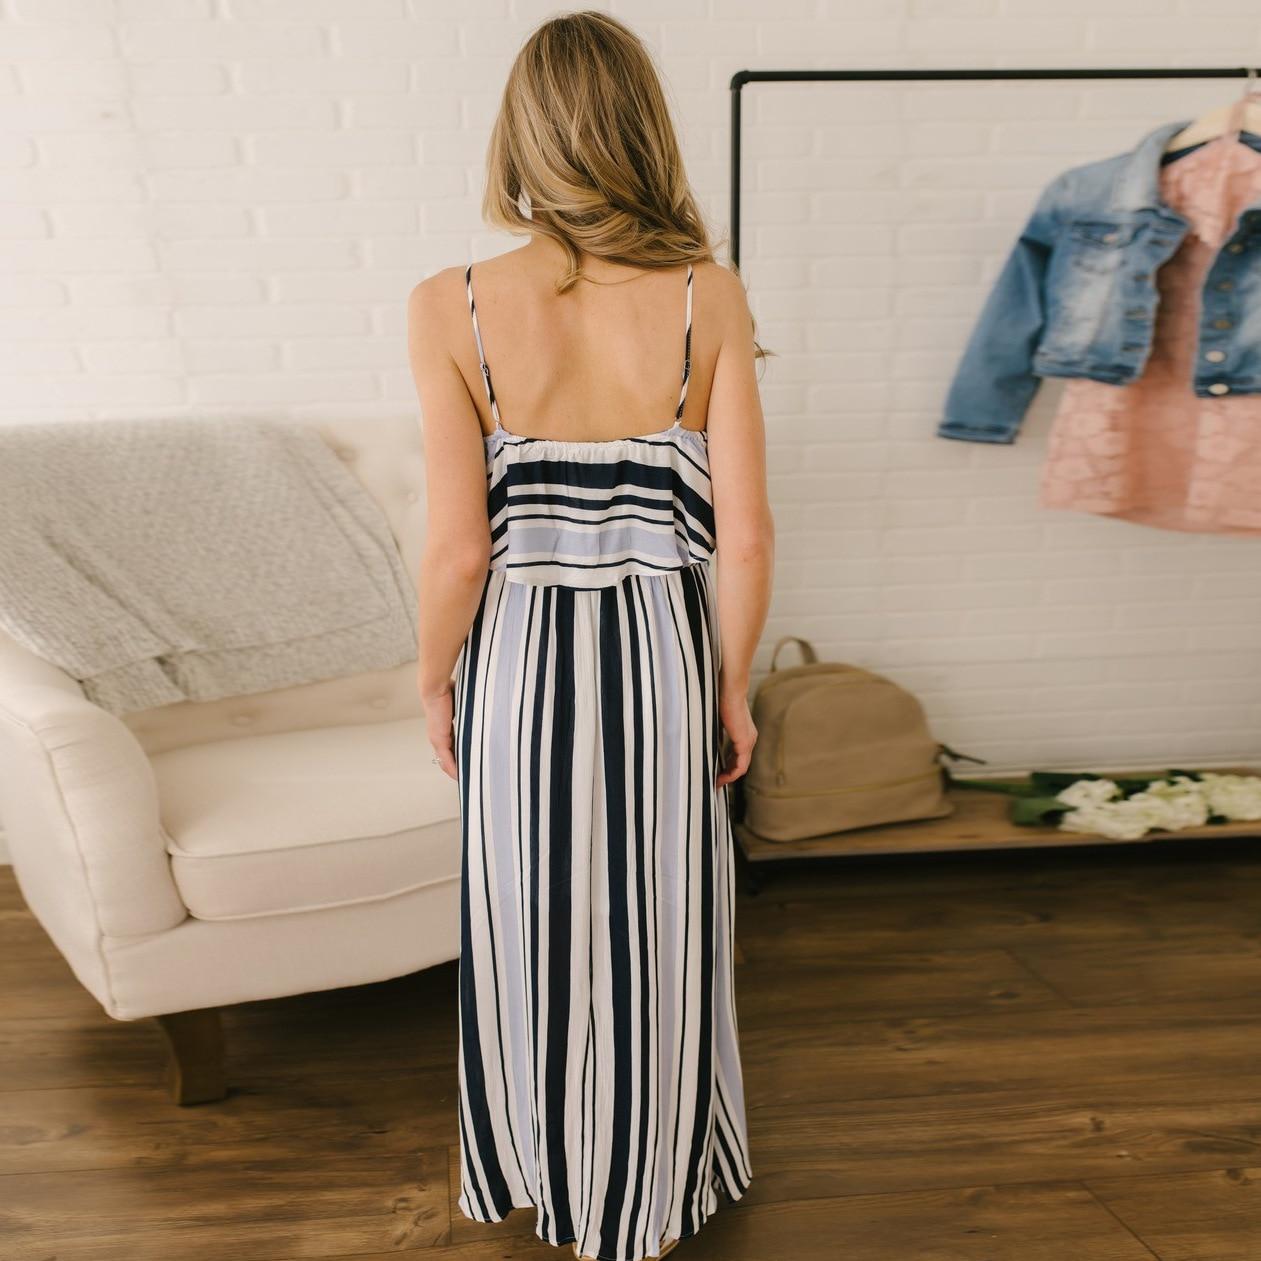 Women Summer Dress 2019 Boho Sexy Long Dress Casual Loose Sundress Ruffles Backless Striped Floor Length Beach Dress White Tunic in Dresses from Women 39 s Clothing